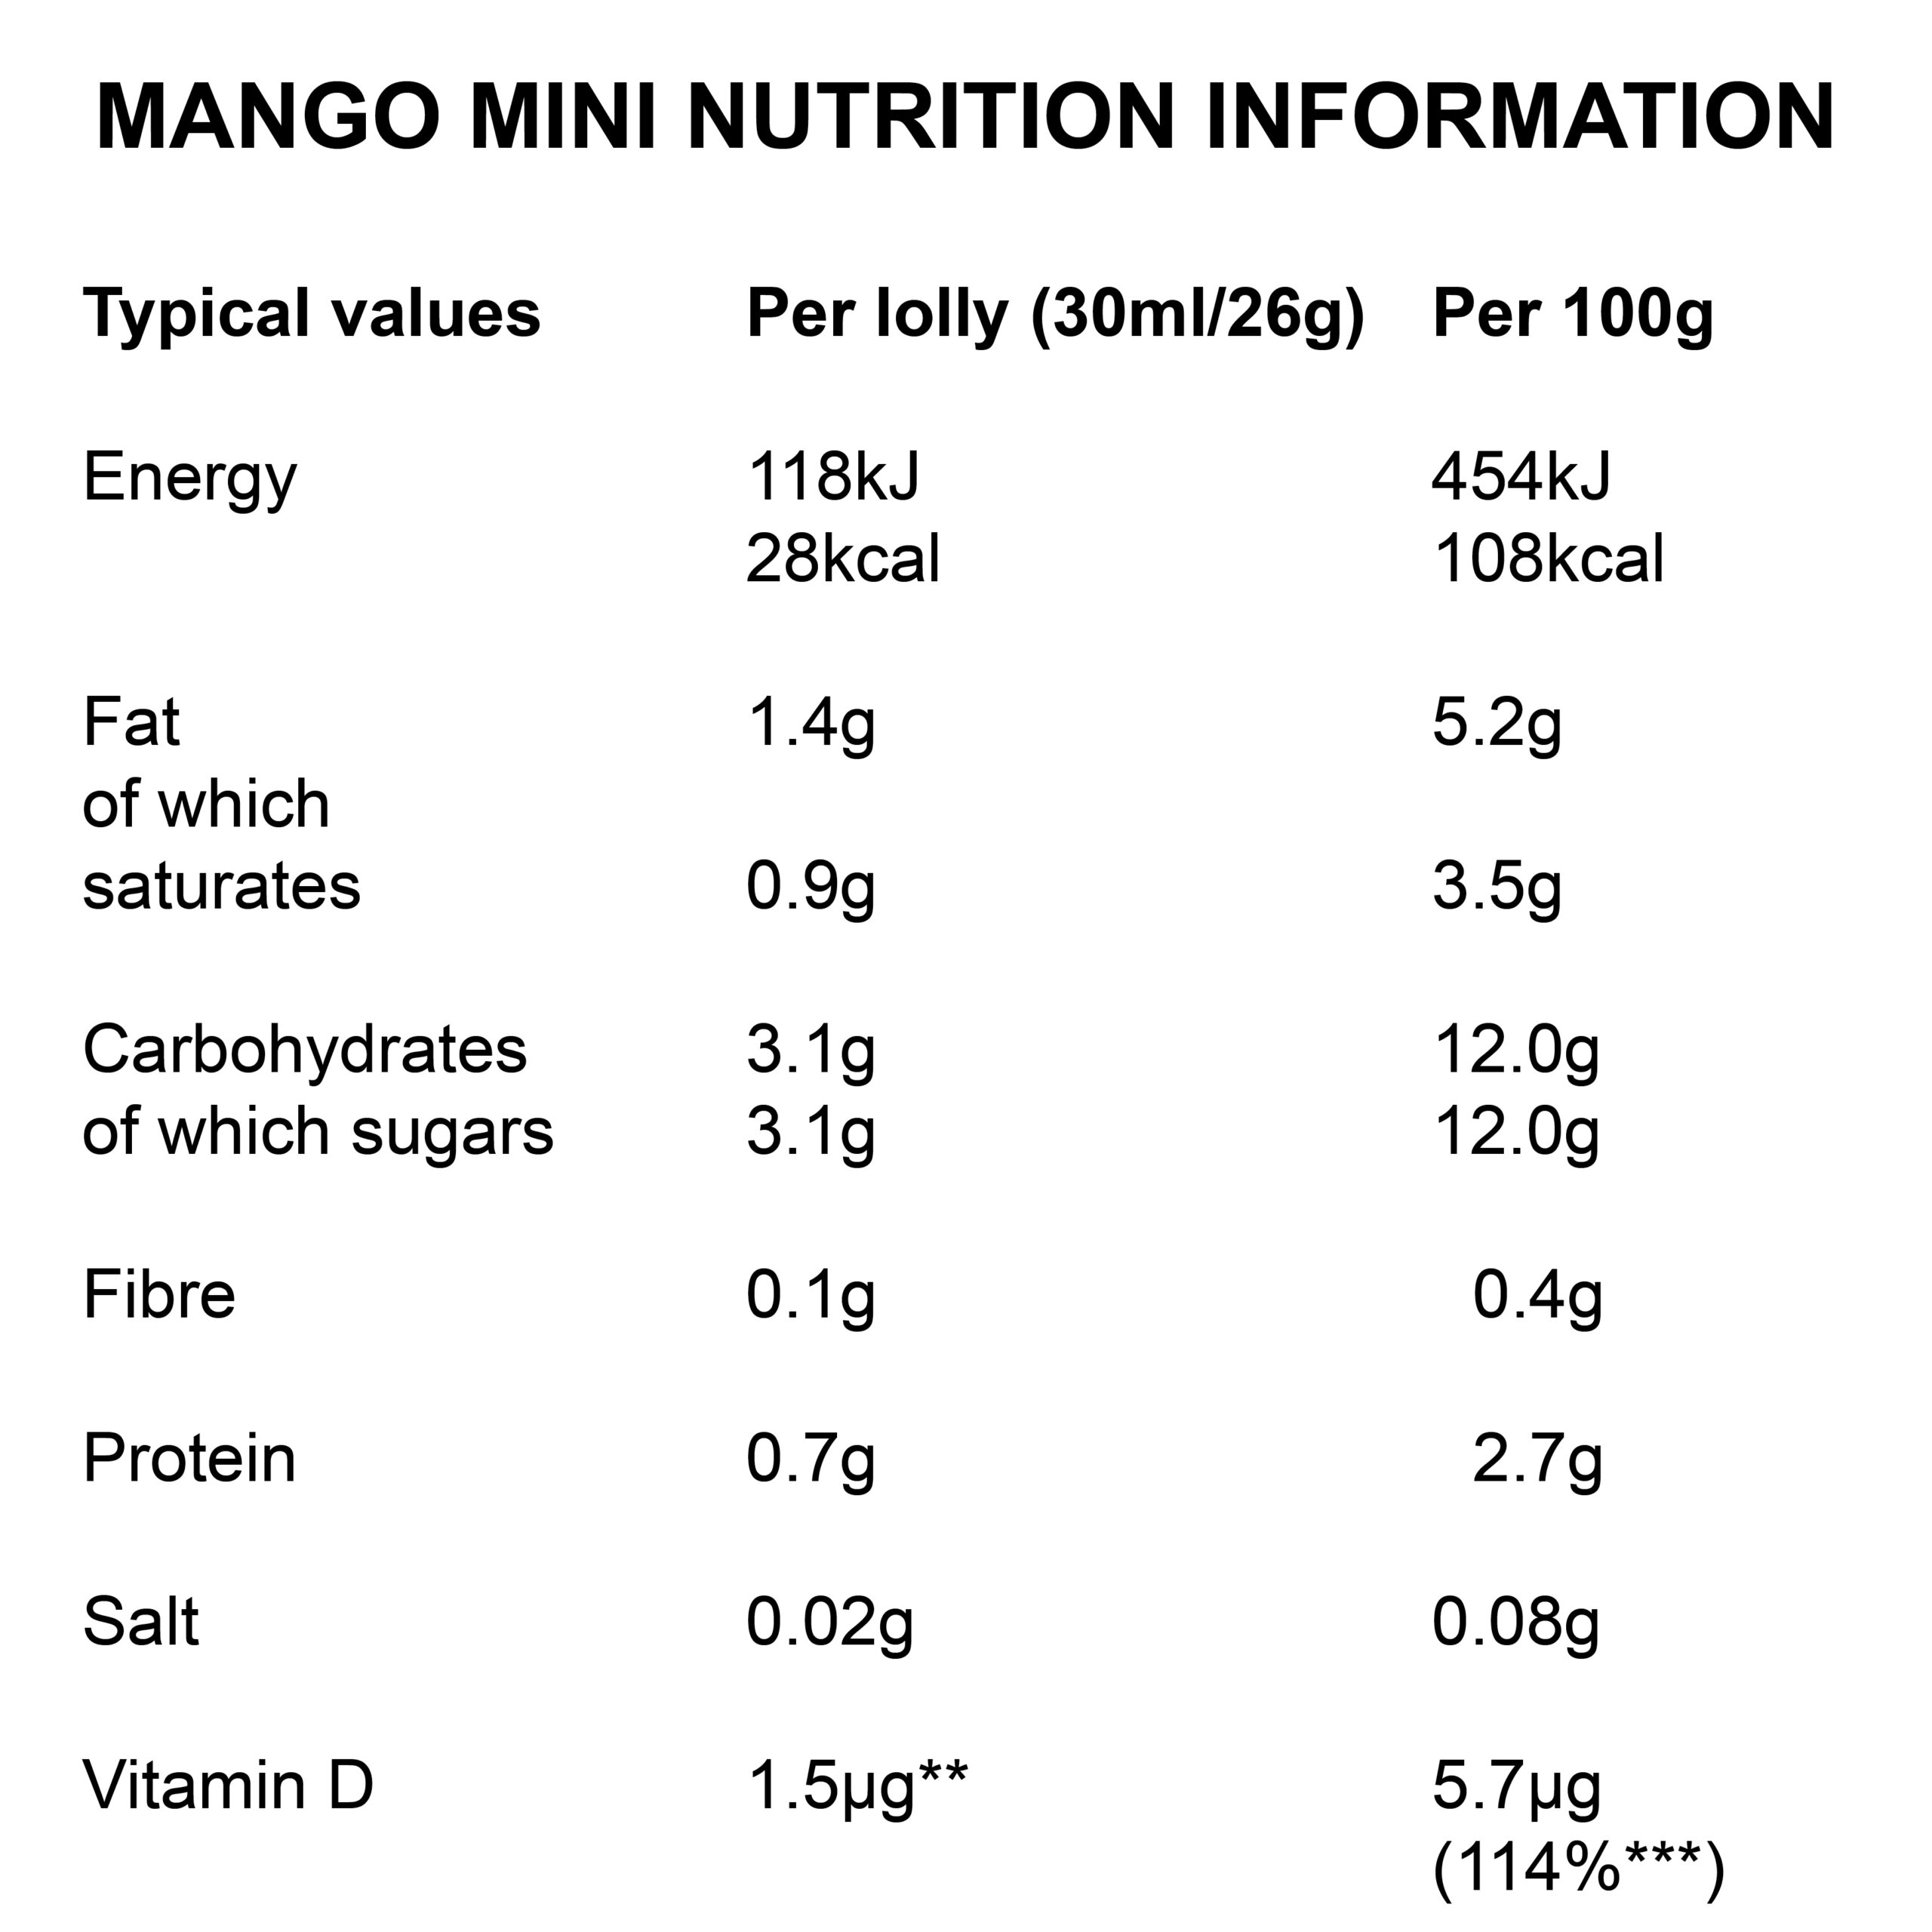 MANGO MINI nutritional information